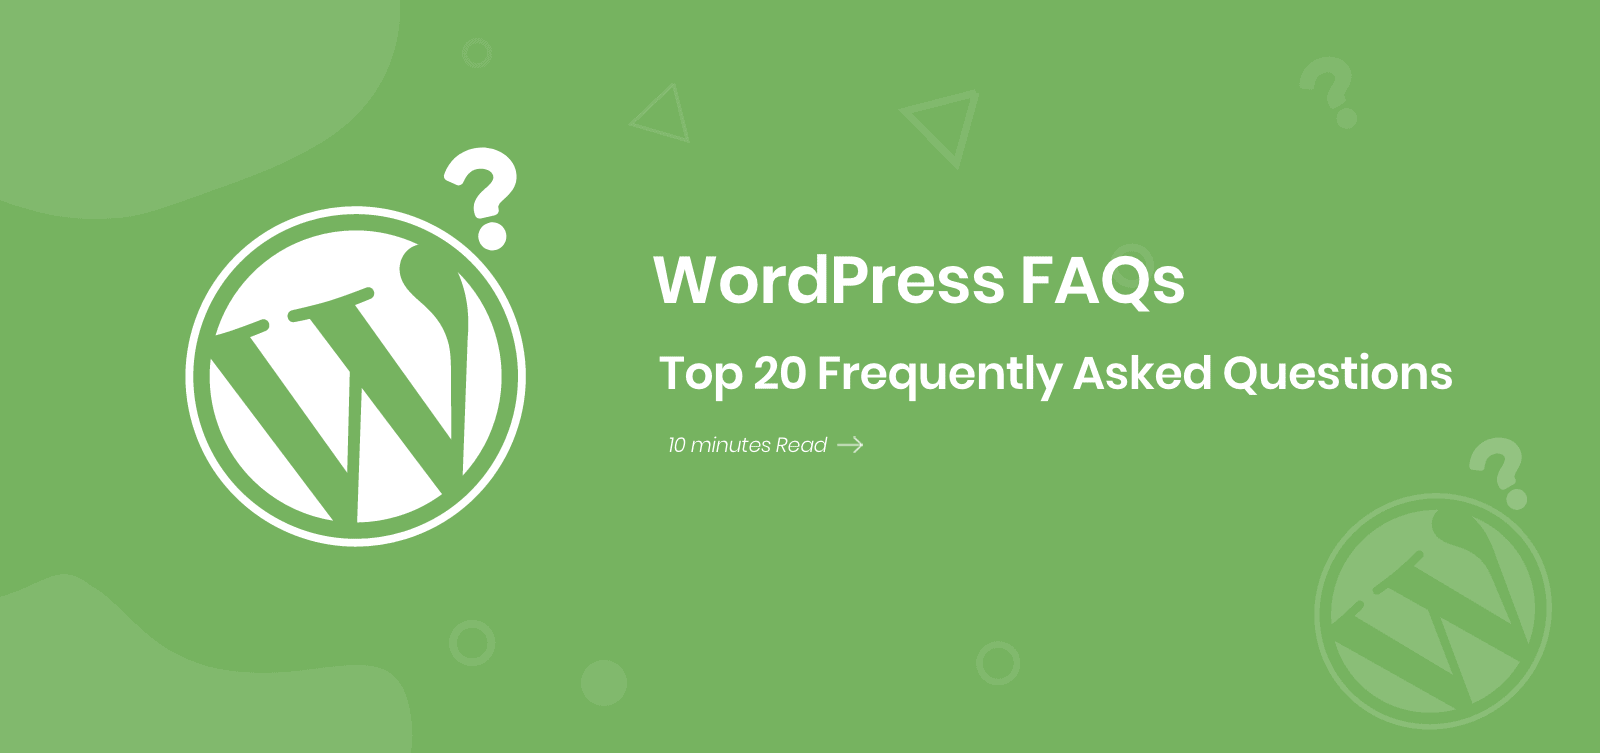 top 20 WordPress FAQs